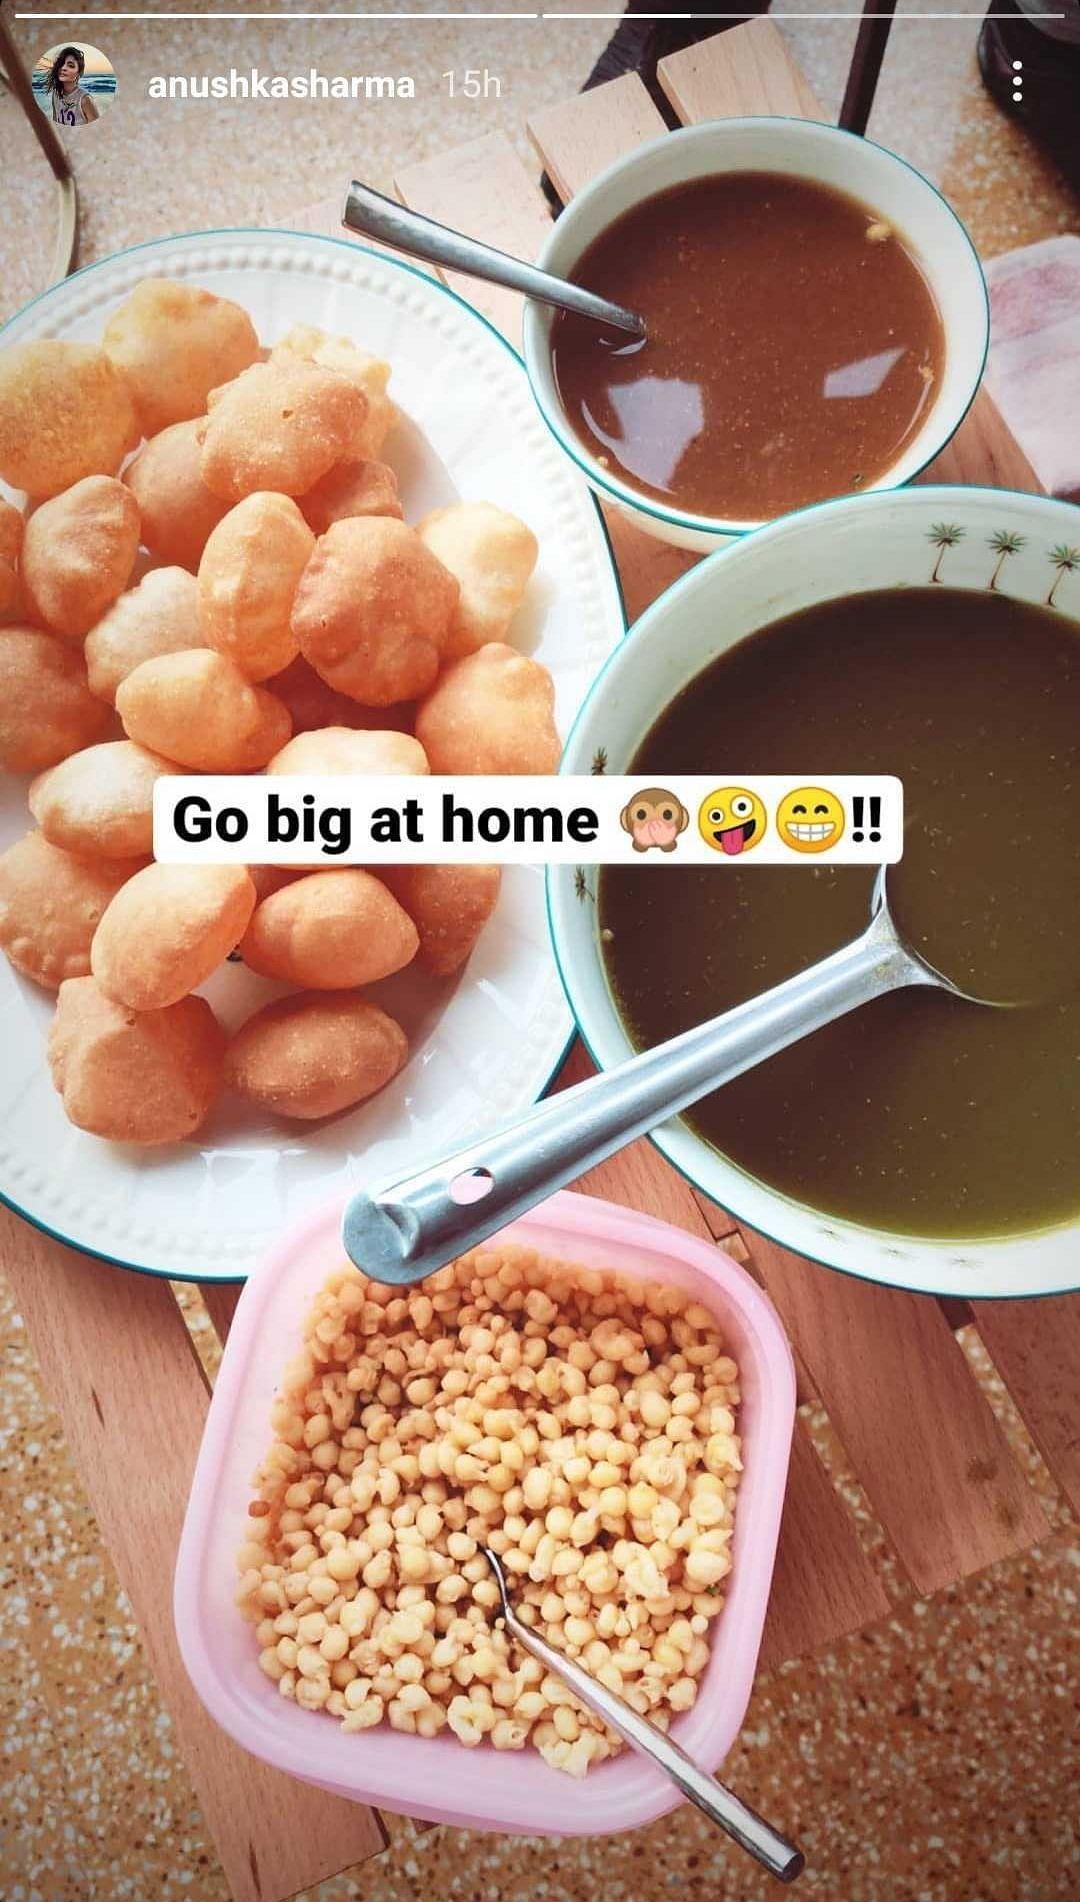 Mom-to-be Anushka Sharma indulges in 'Pani Puri' cravings ahead of her due date